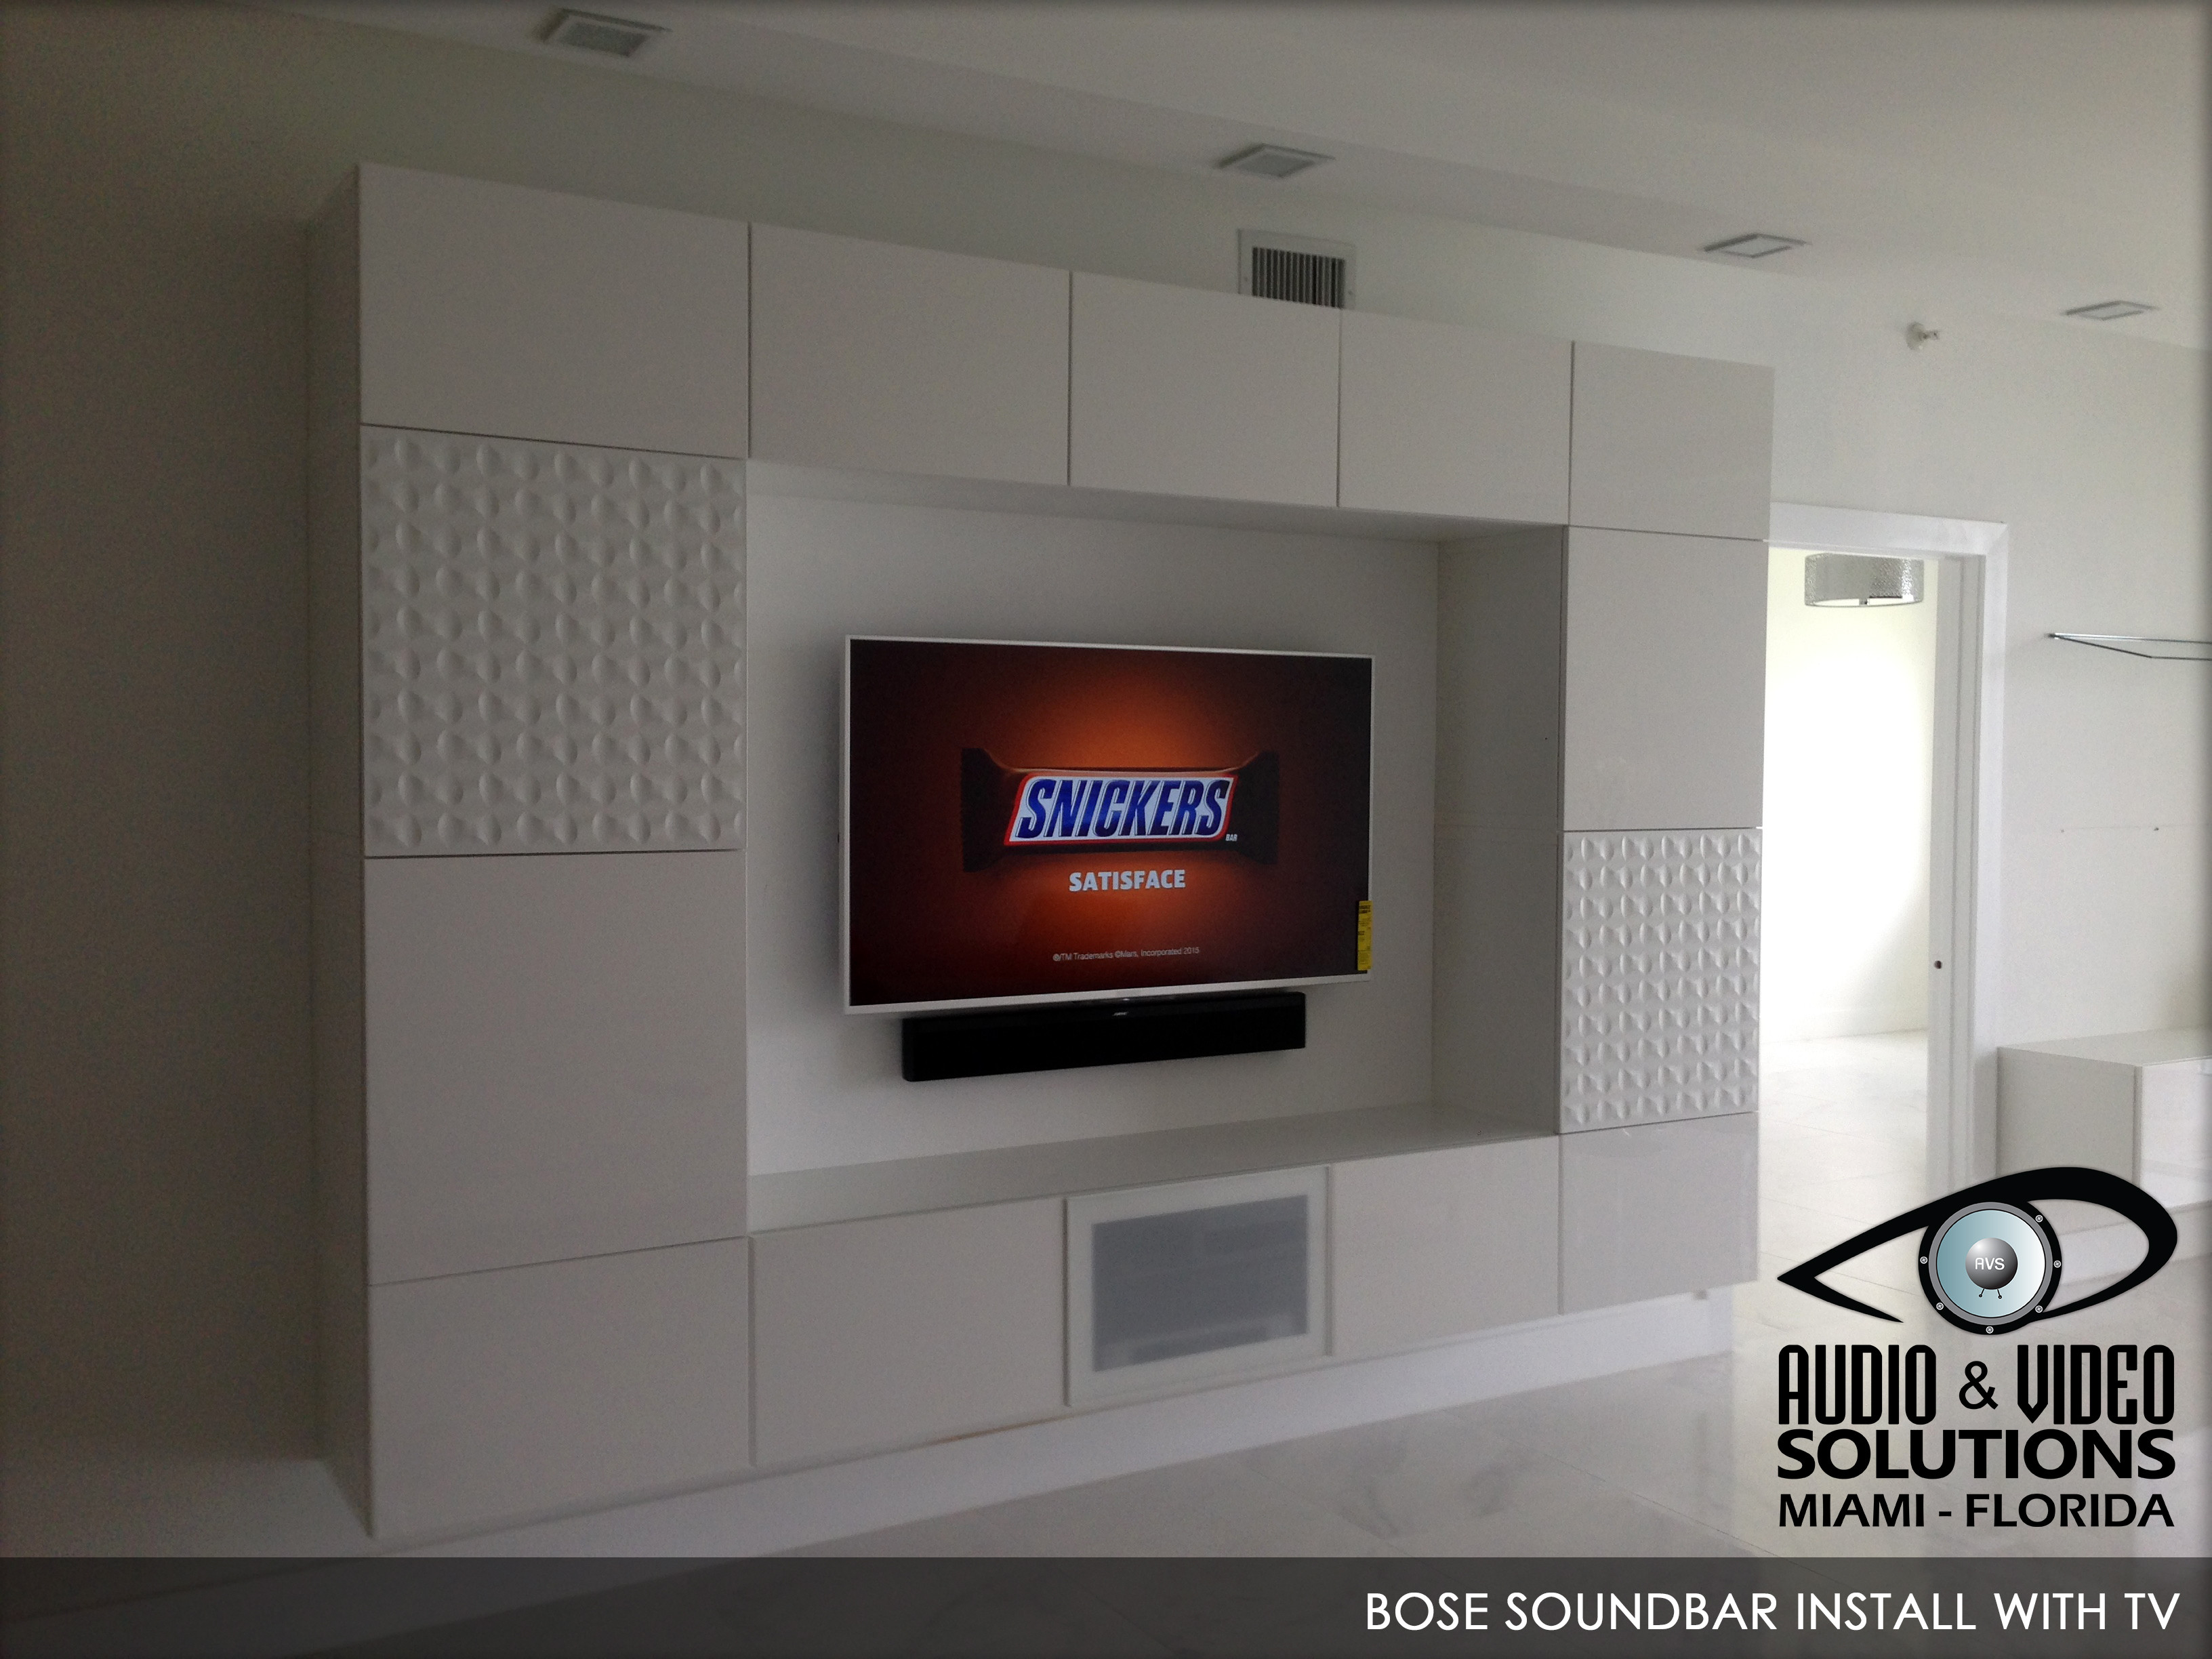 BOSE Soundbar Install with TV